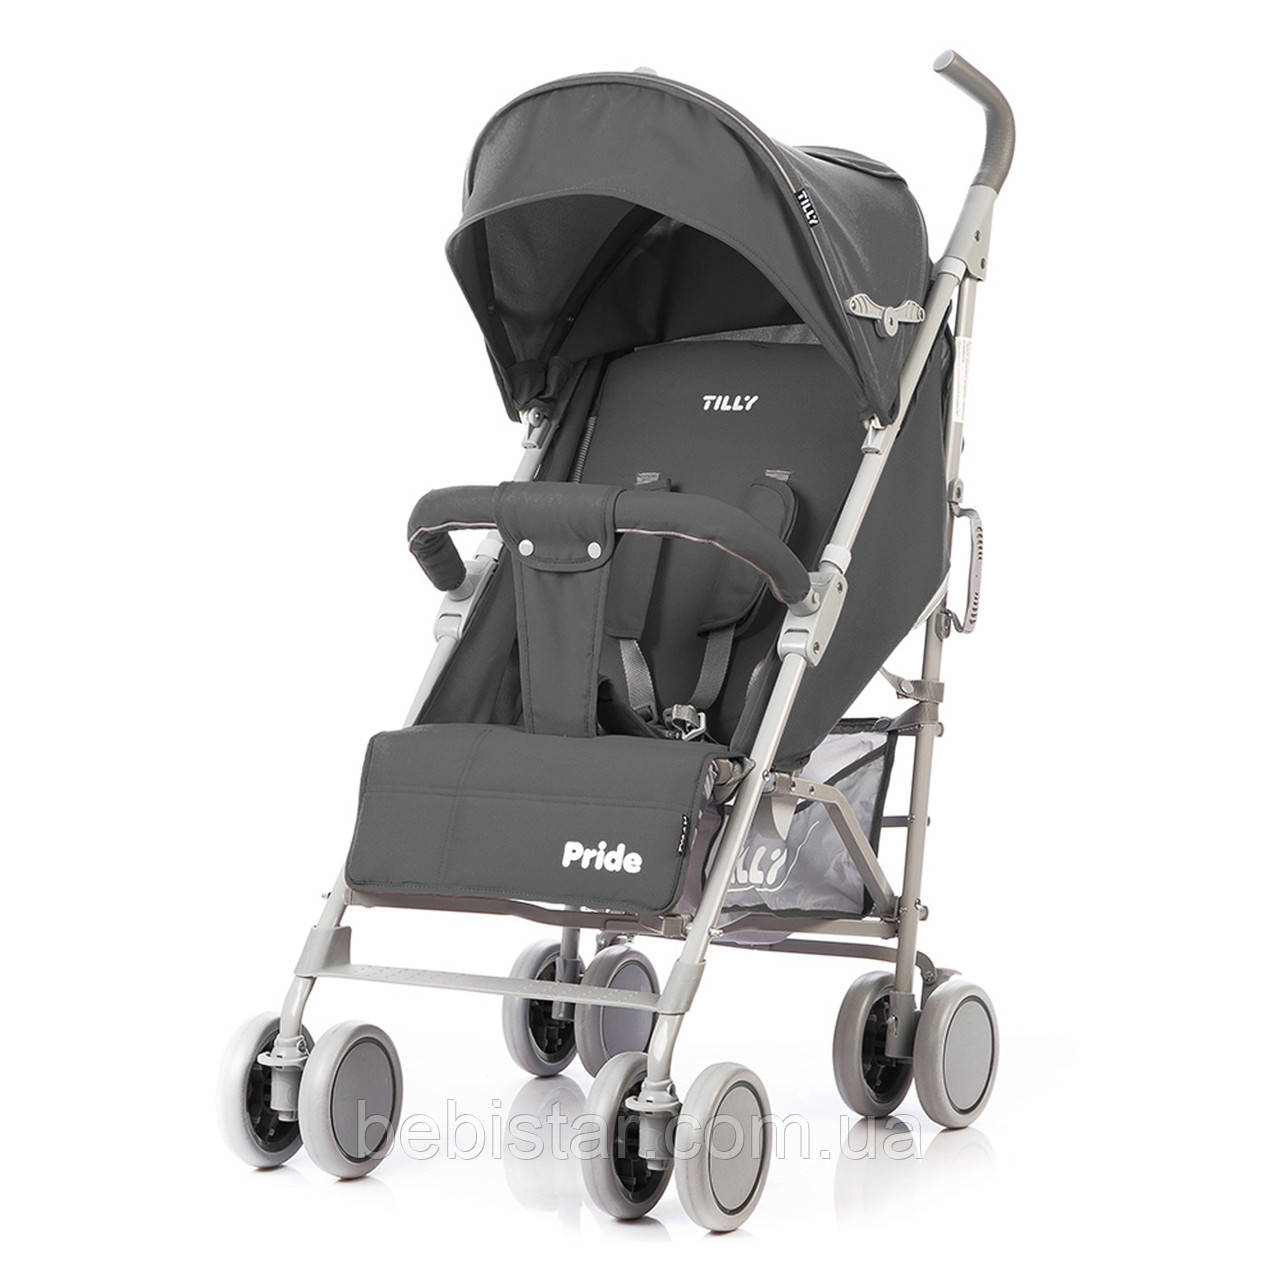 Детская прогулочная коляска TILLY Pride T-1412 Dark Grey